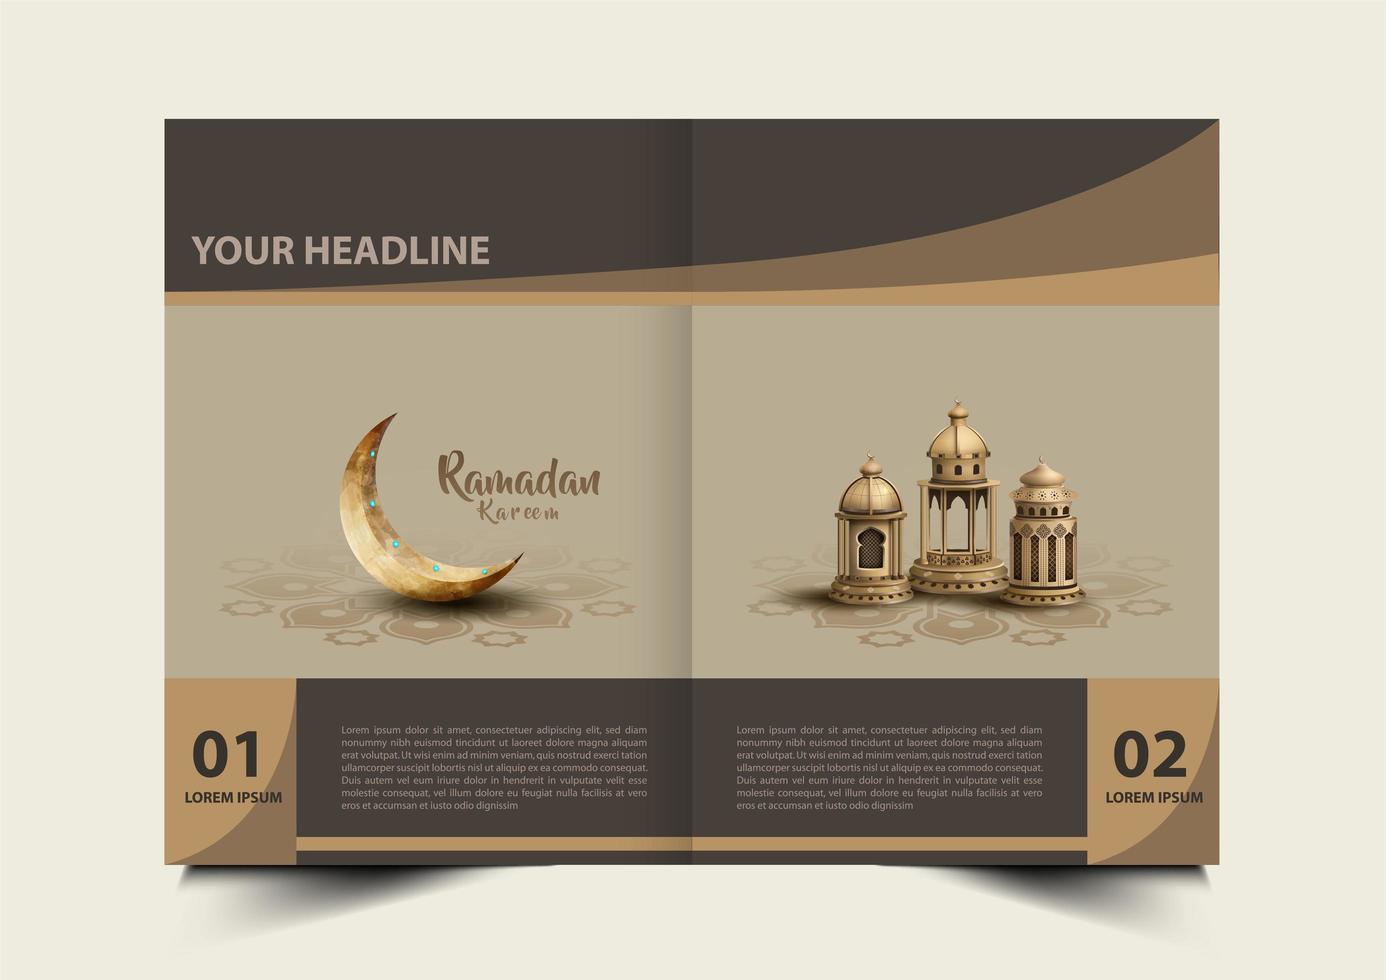 Ramadan Kareem Broschüre vektor